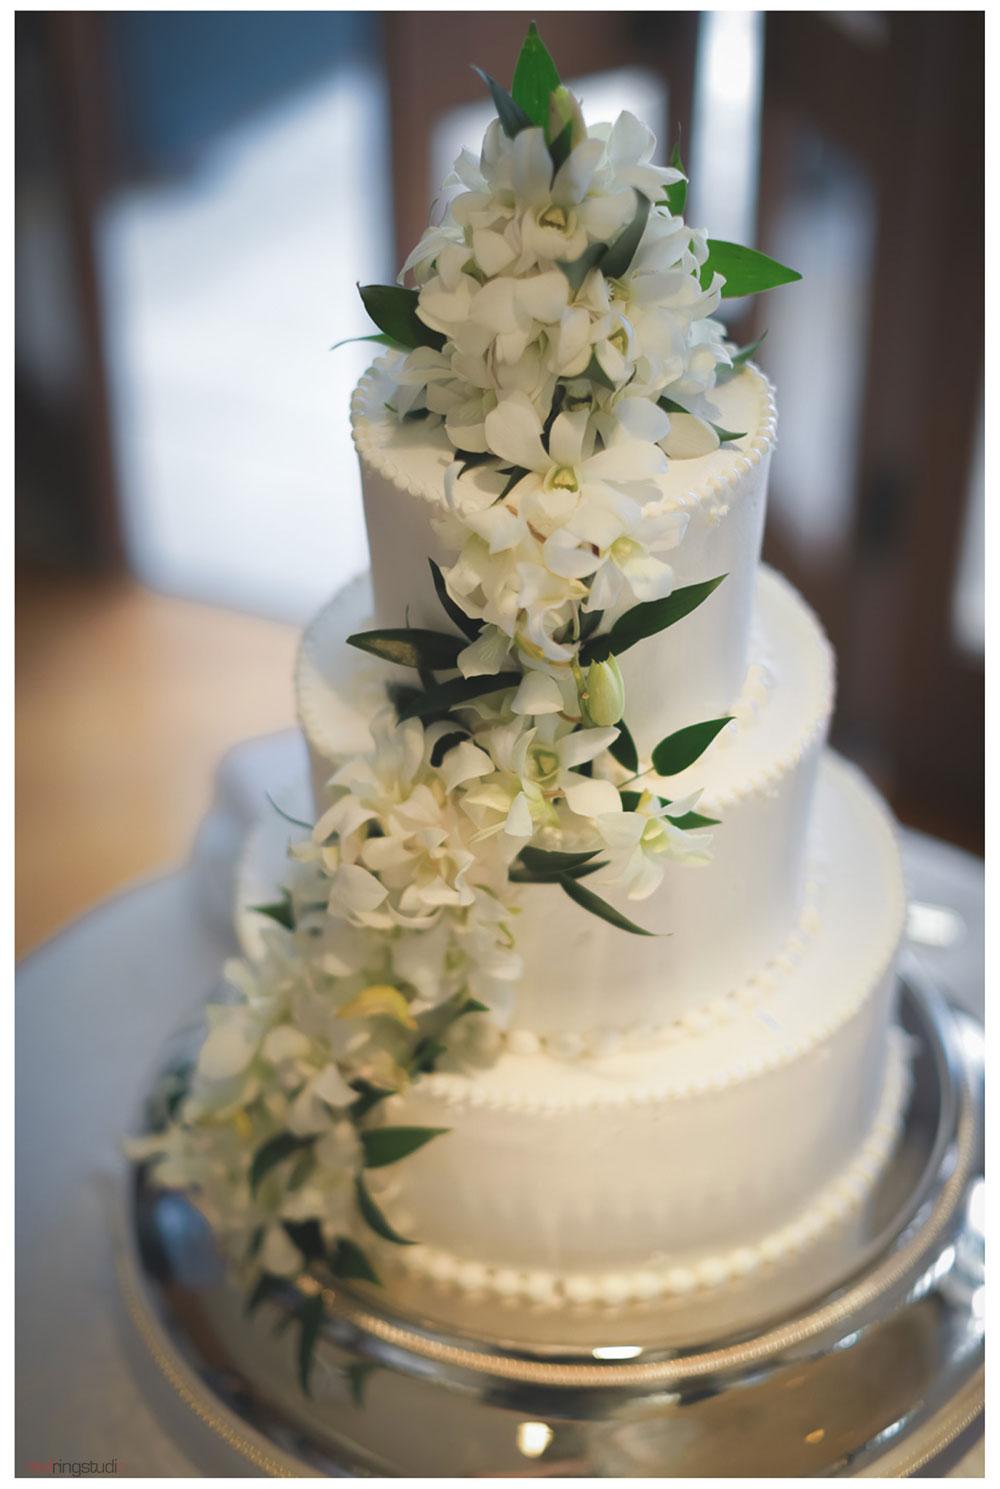 04-Cake.jpg